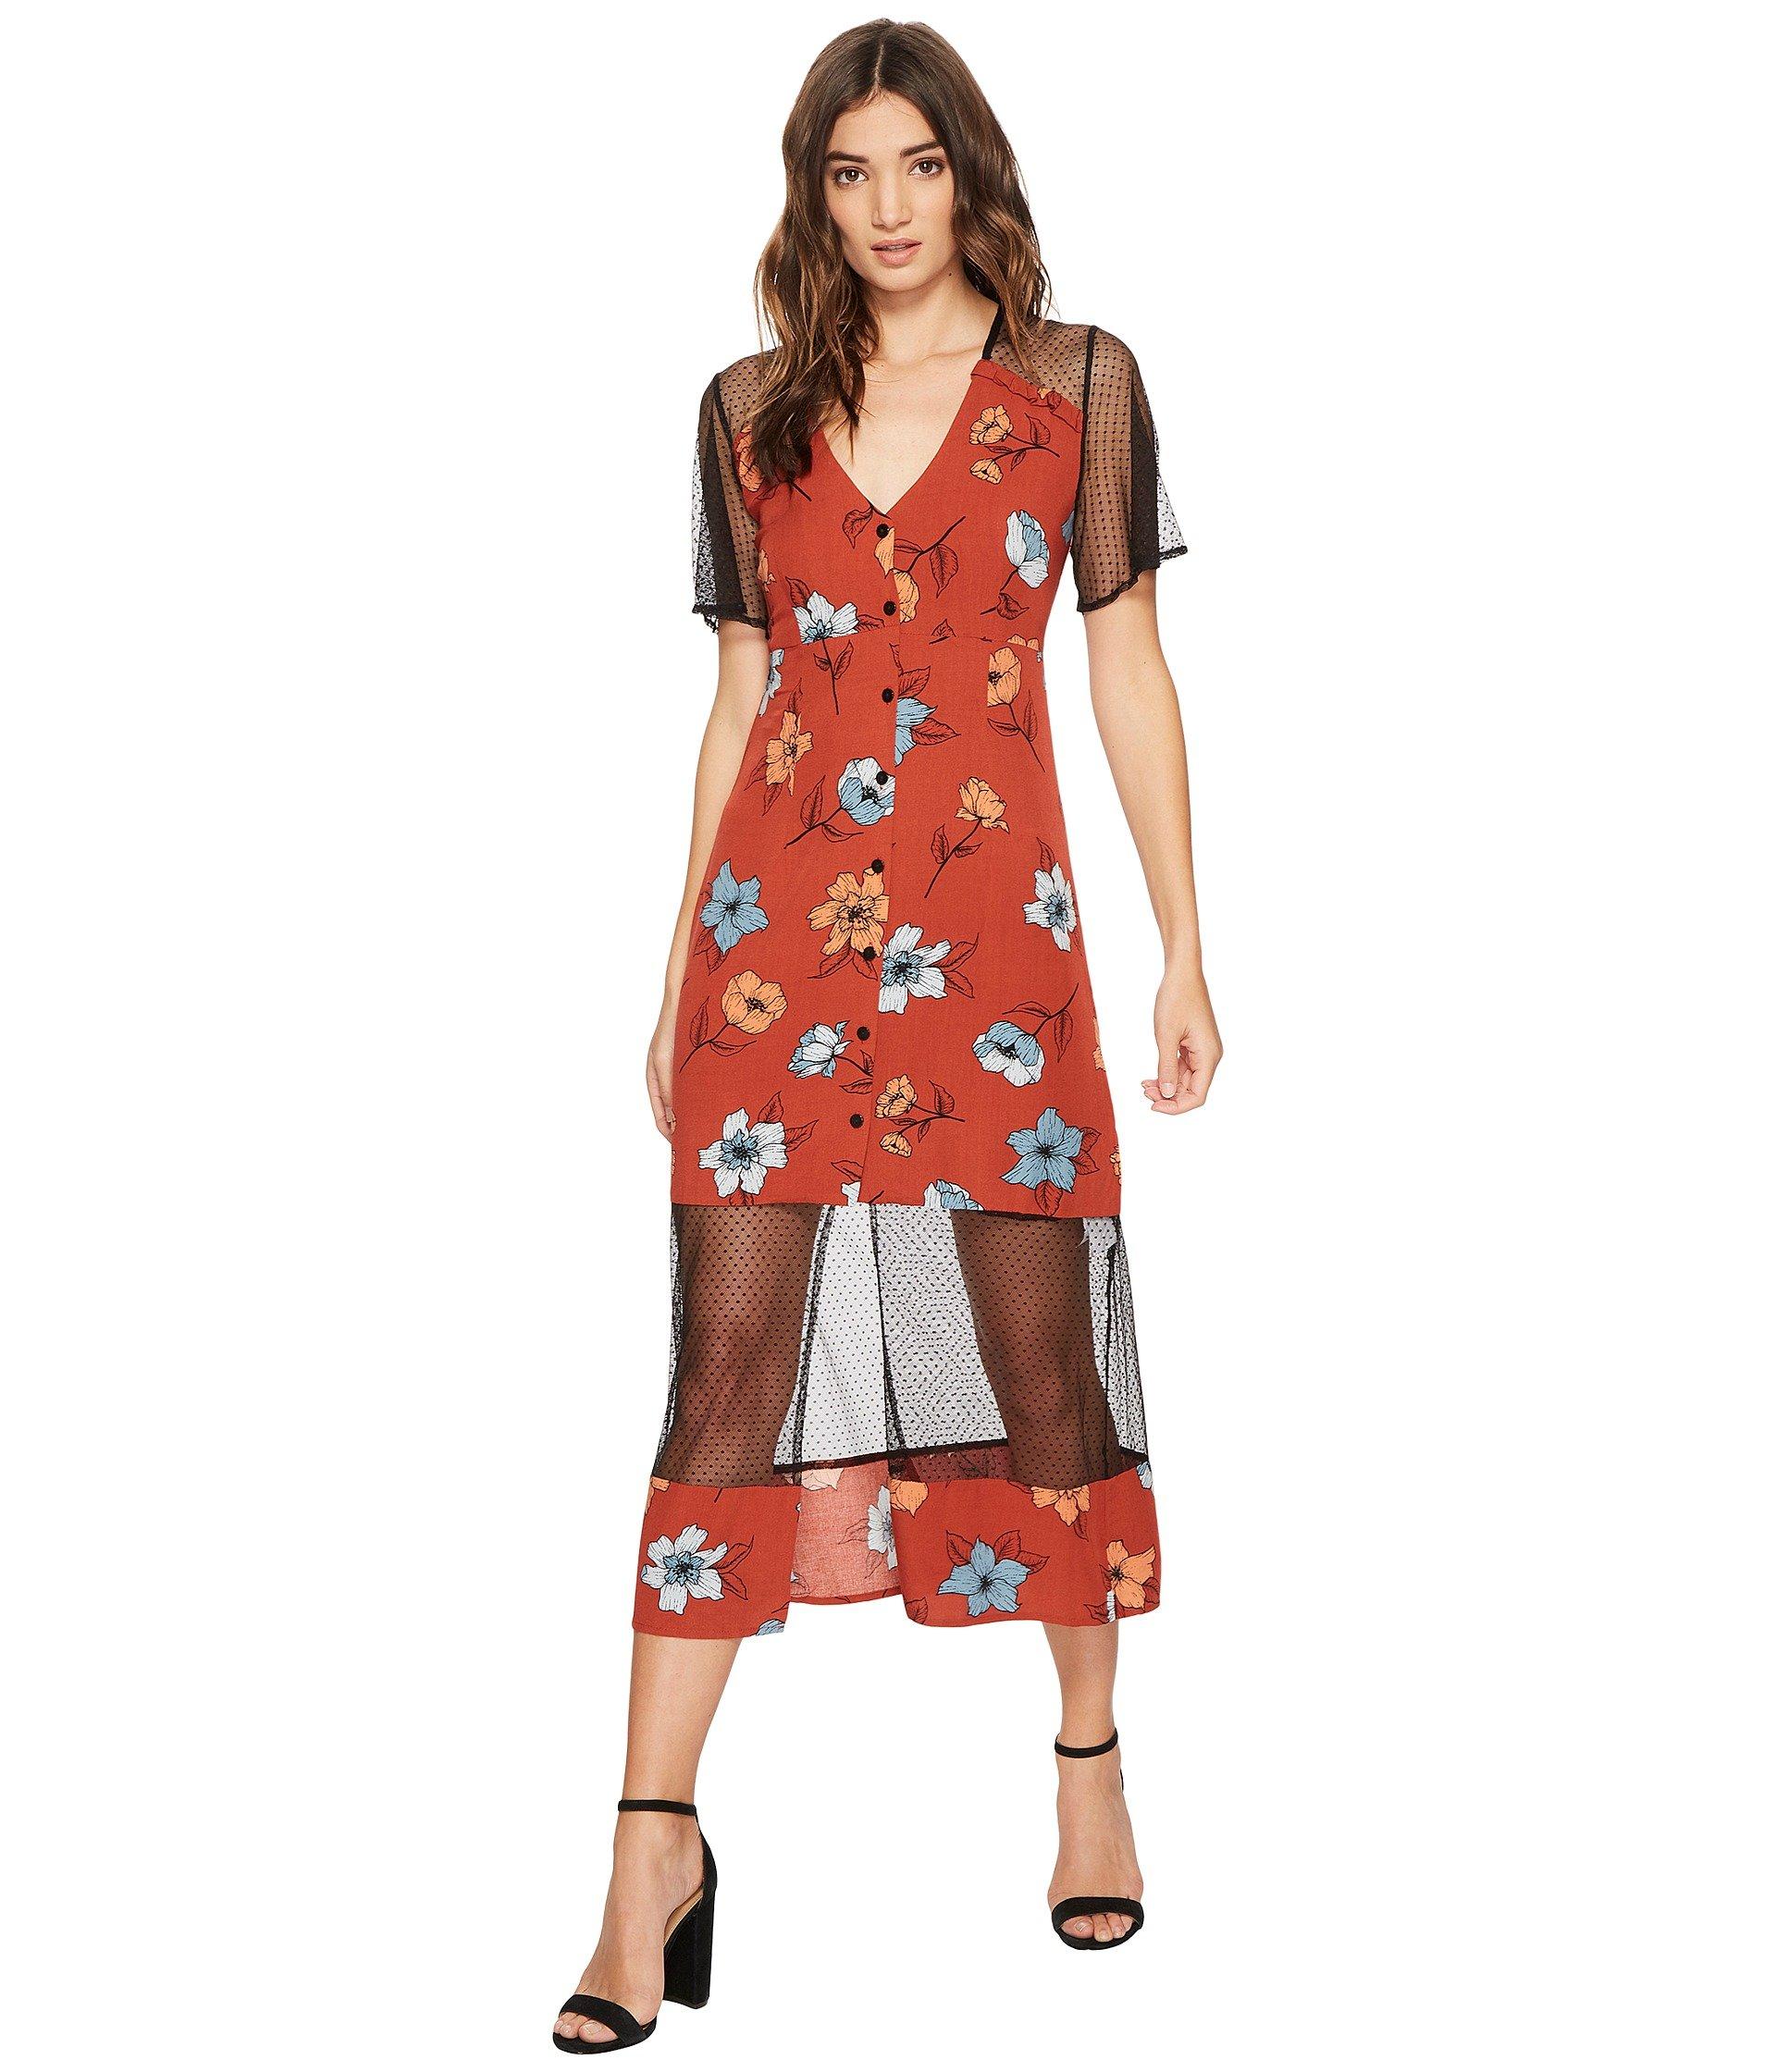 Minkpink Ornate Midi Dress